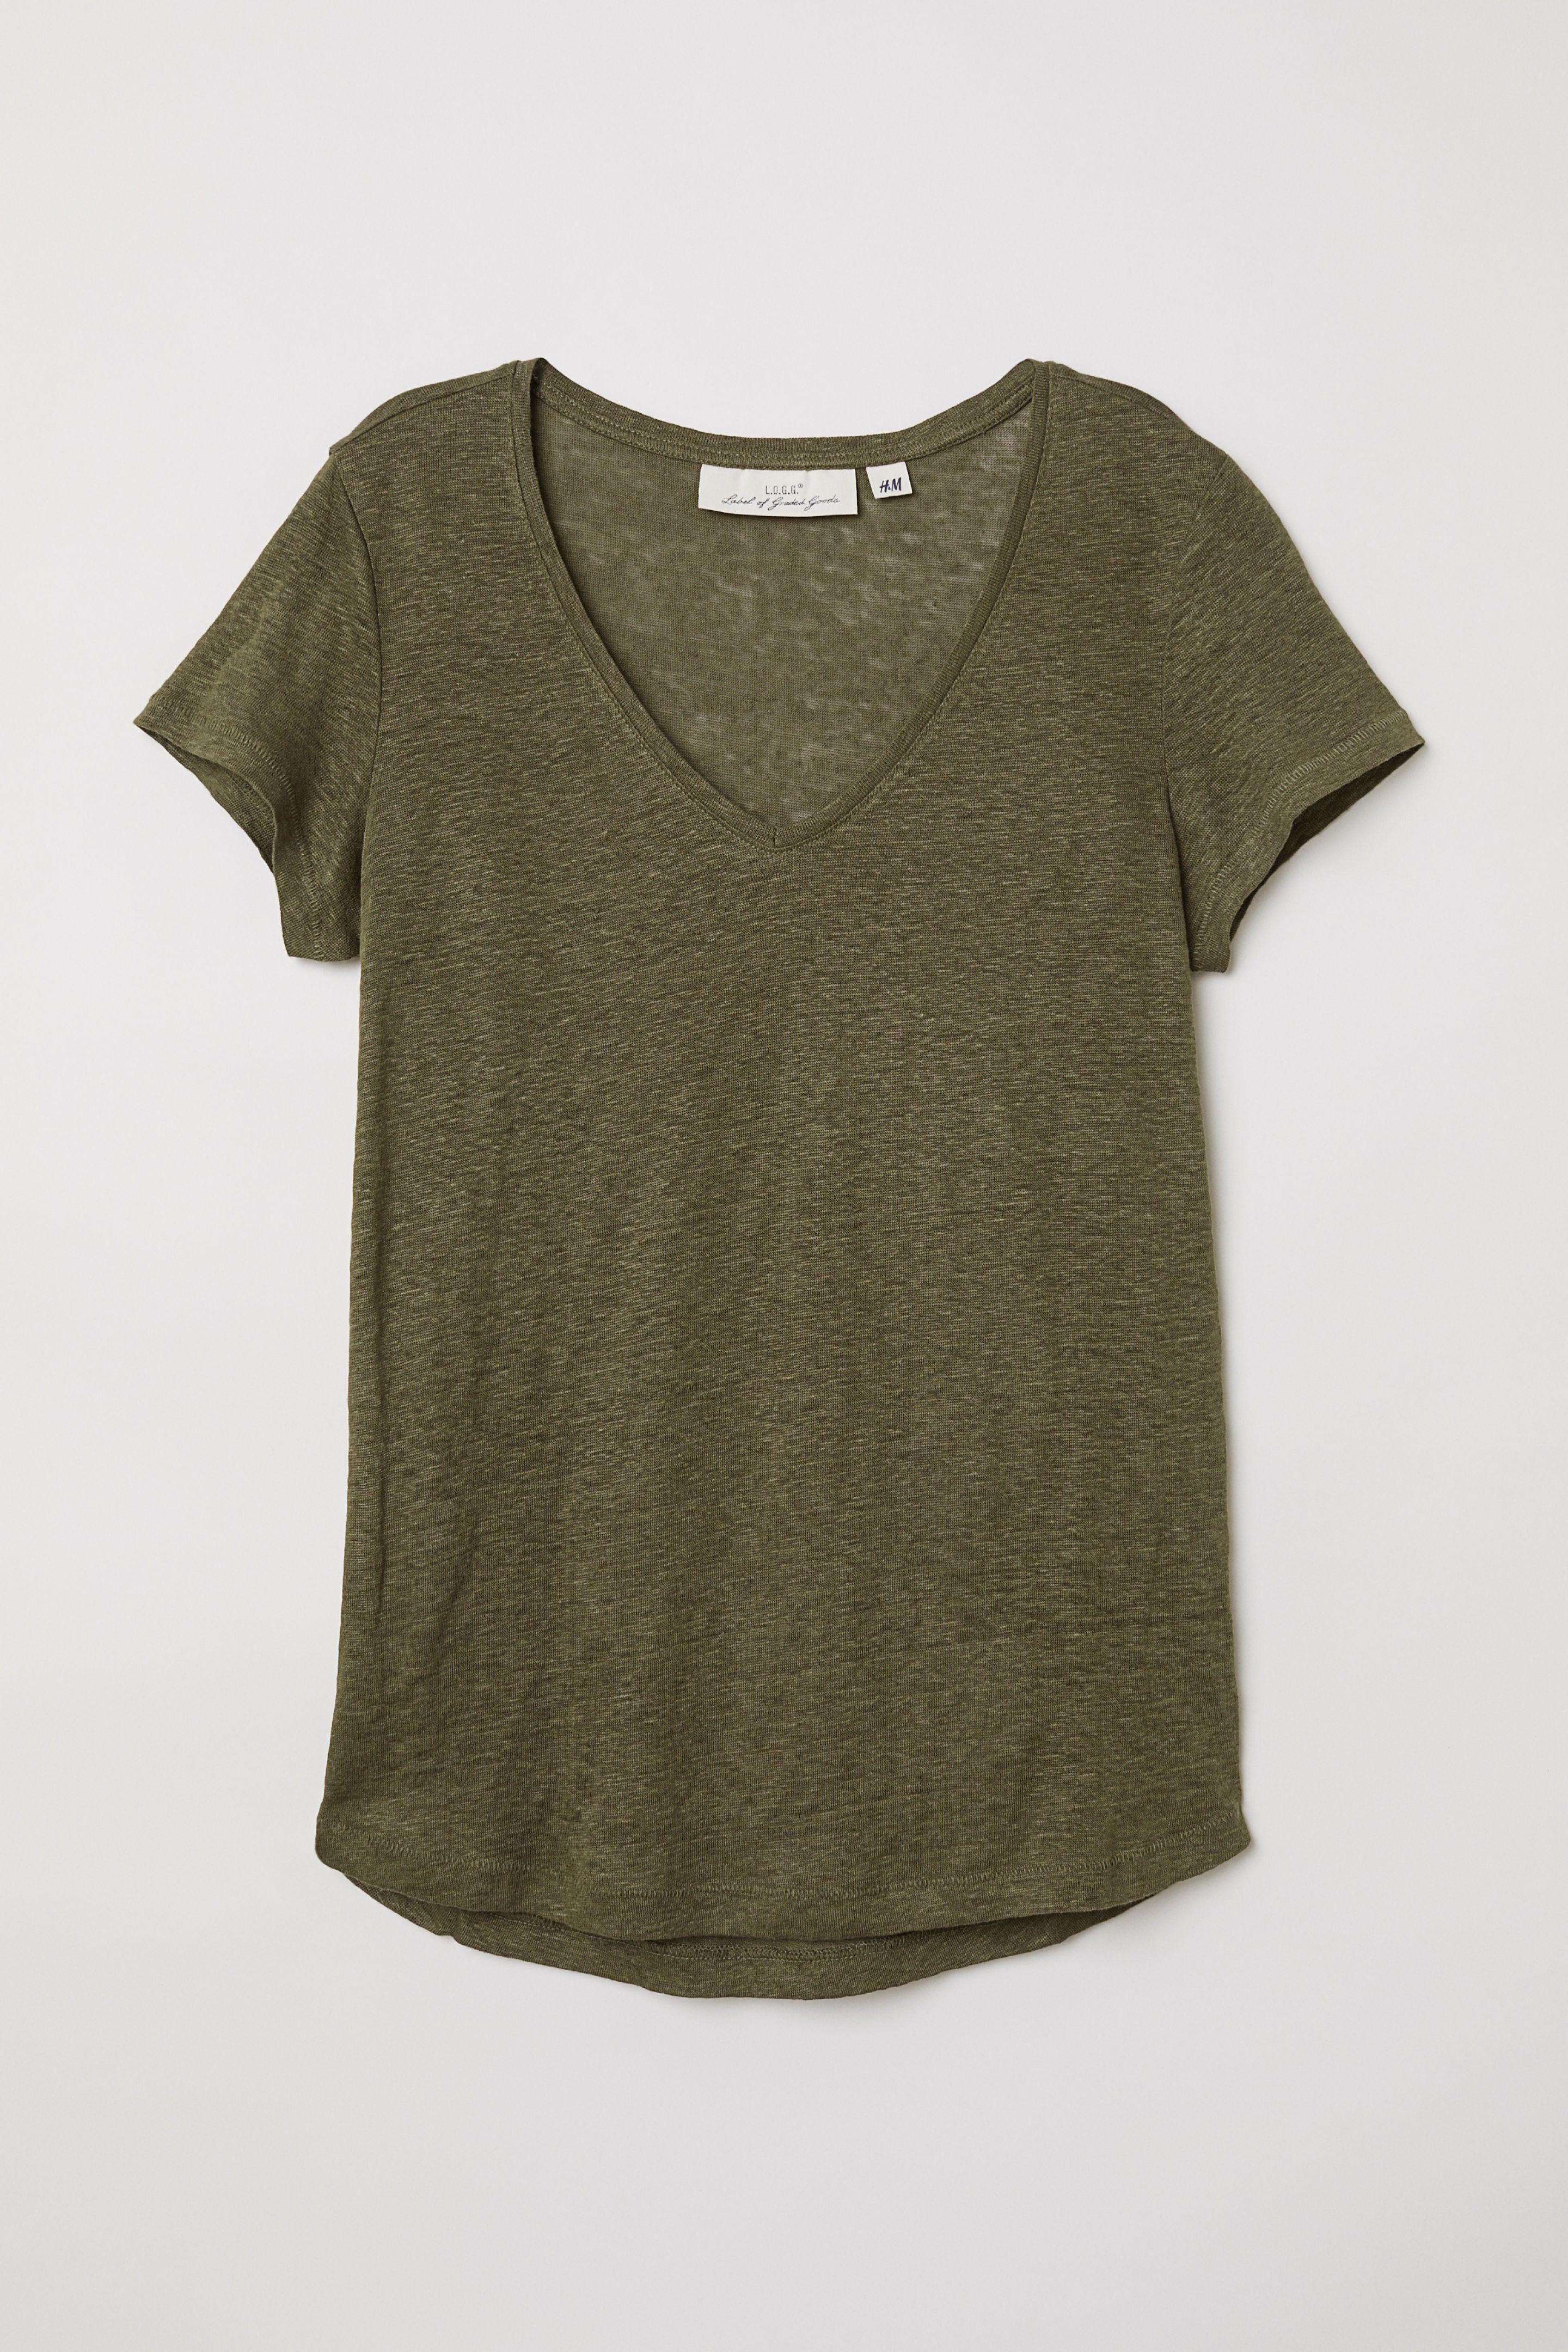 H&m green lace dress  Льняной топ  Формула гардероба Составление  Pinterest  Tops